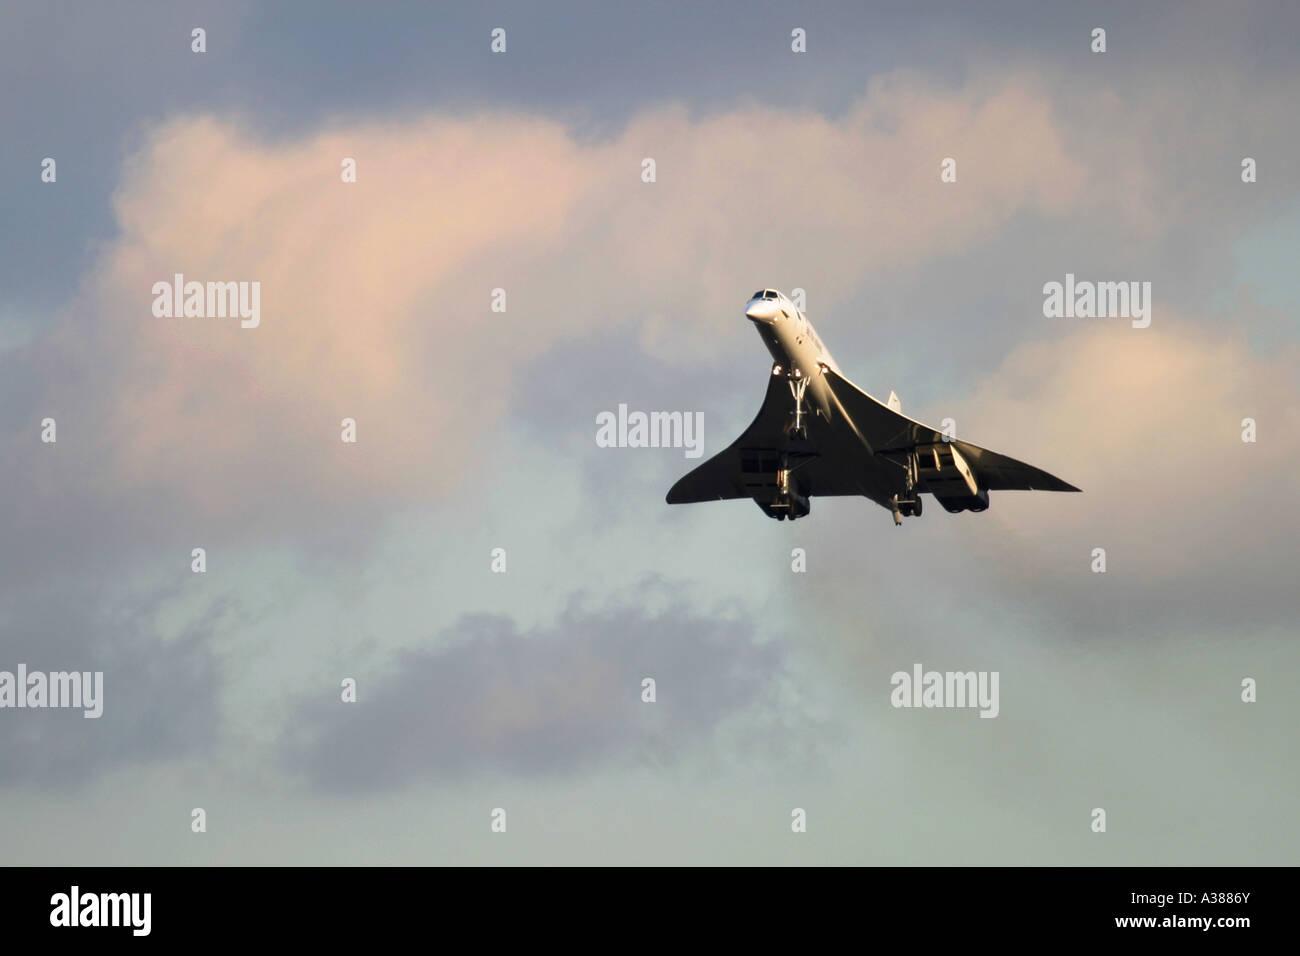 British Airways Aerospatiale-British Aerospace Concorde 102  landing at London Heathrow Airport for the last time - Stock Image